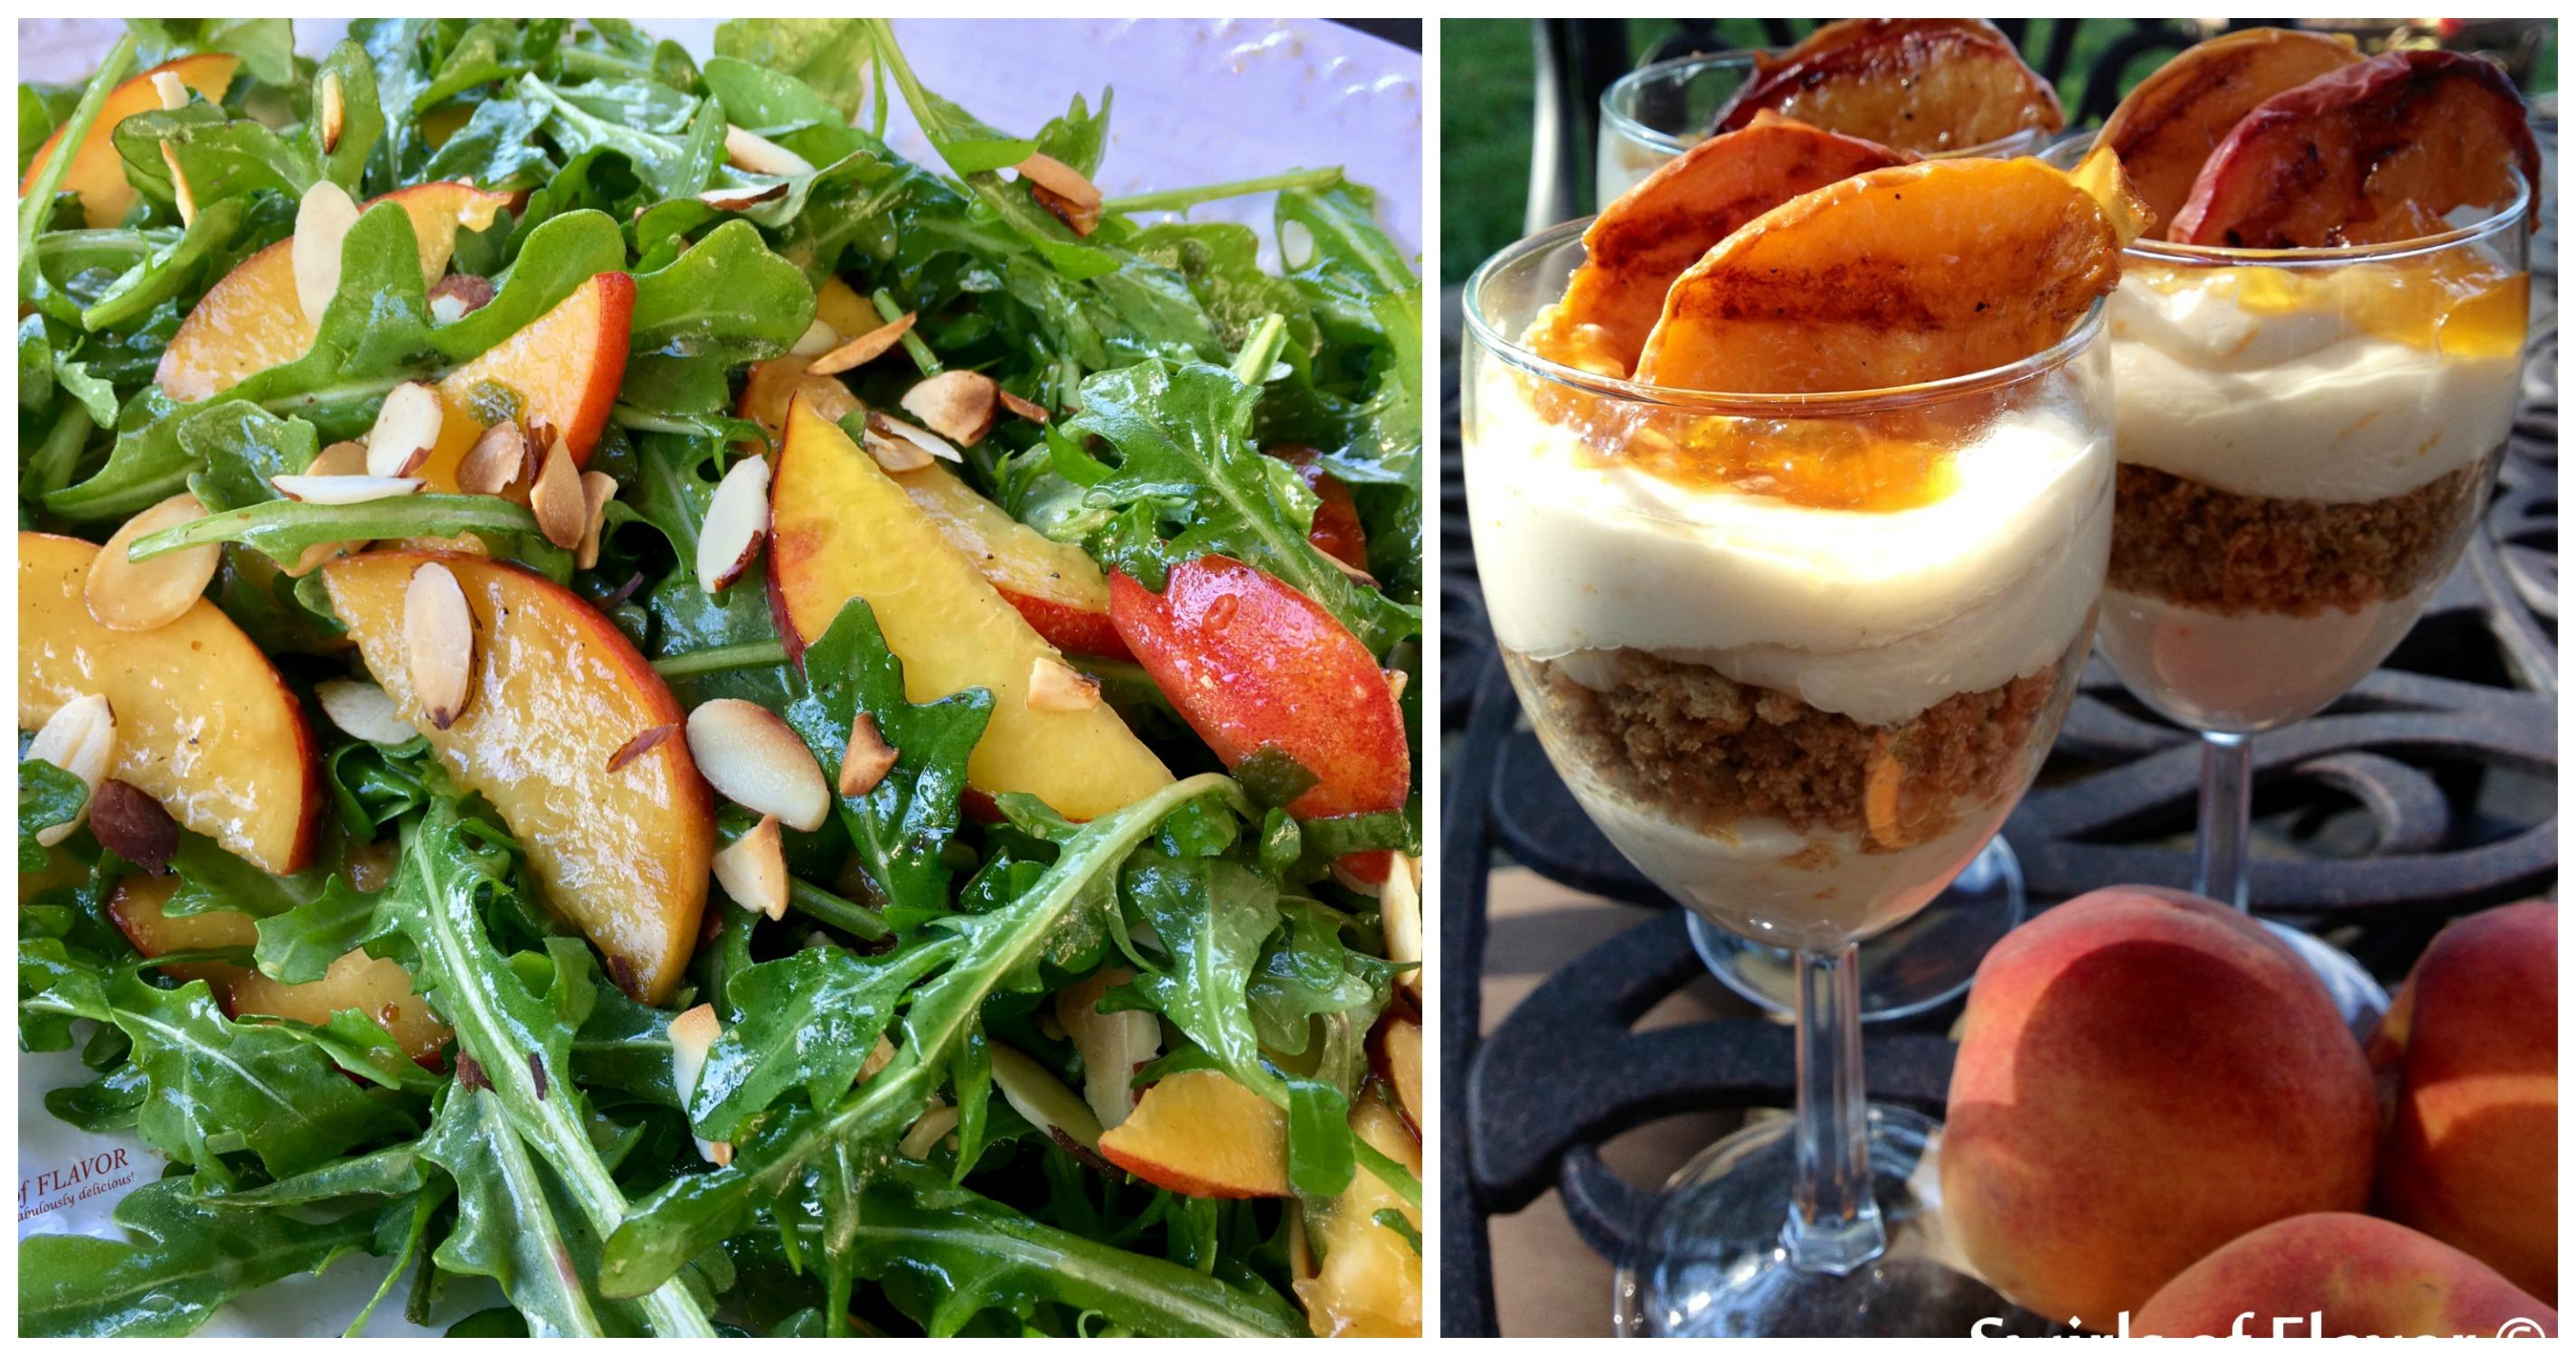 Peach Arugula Salad and Grilled Peach Cheesecake Parfaits